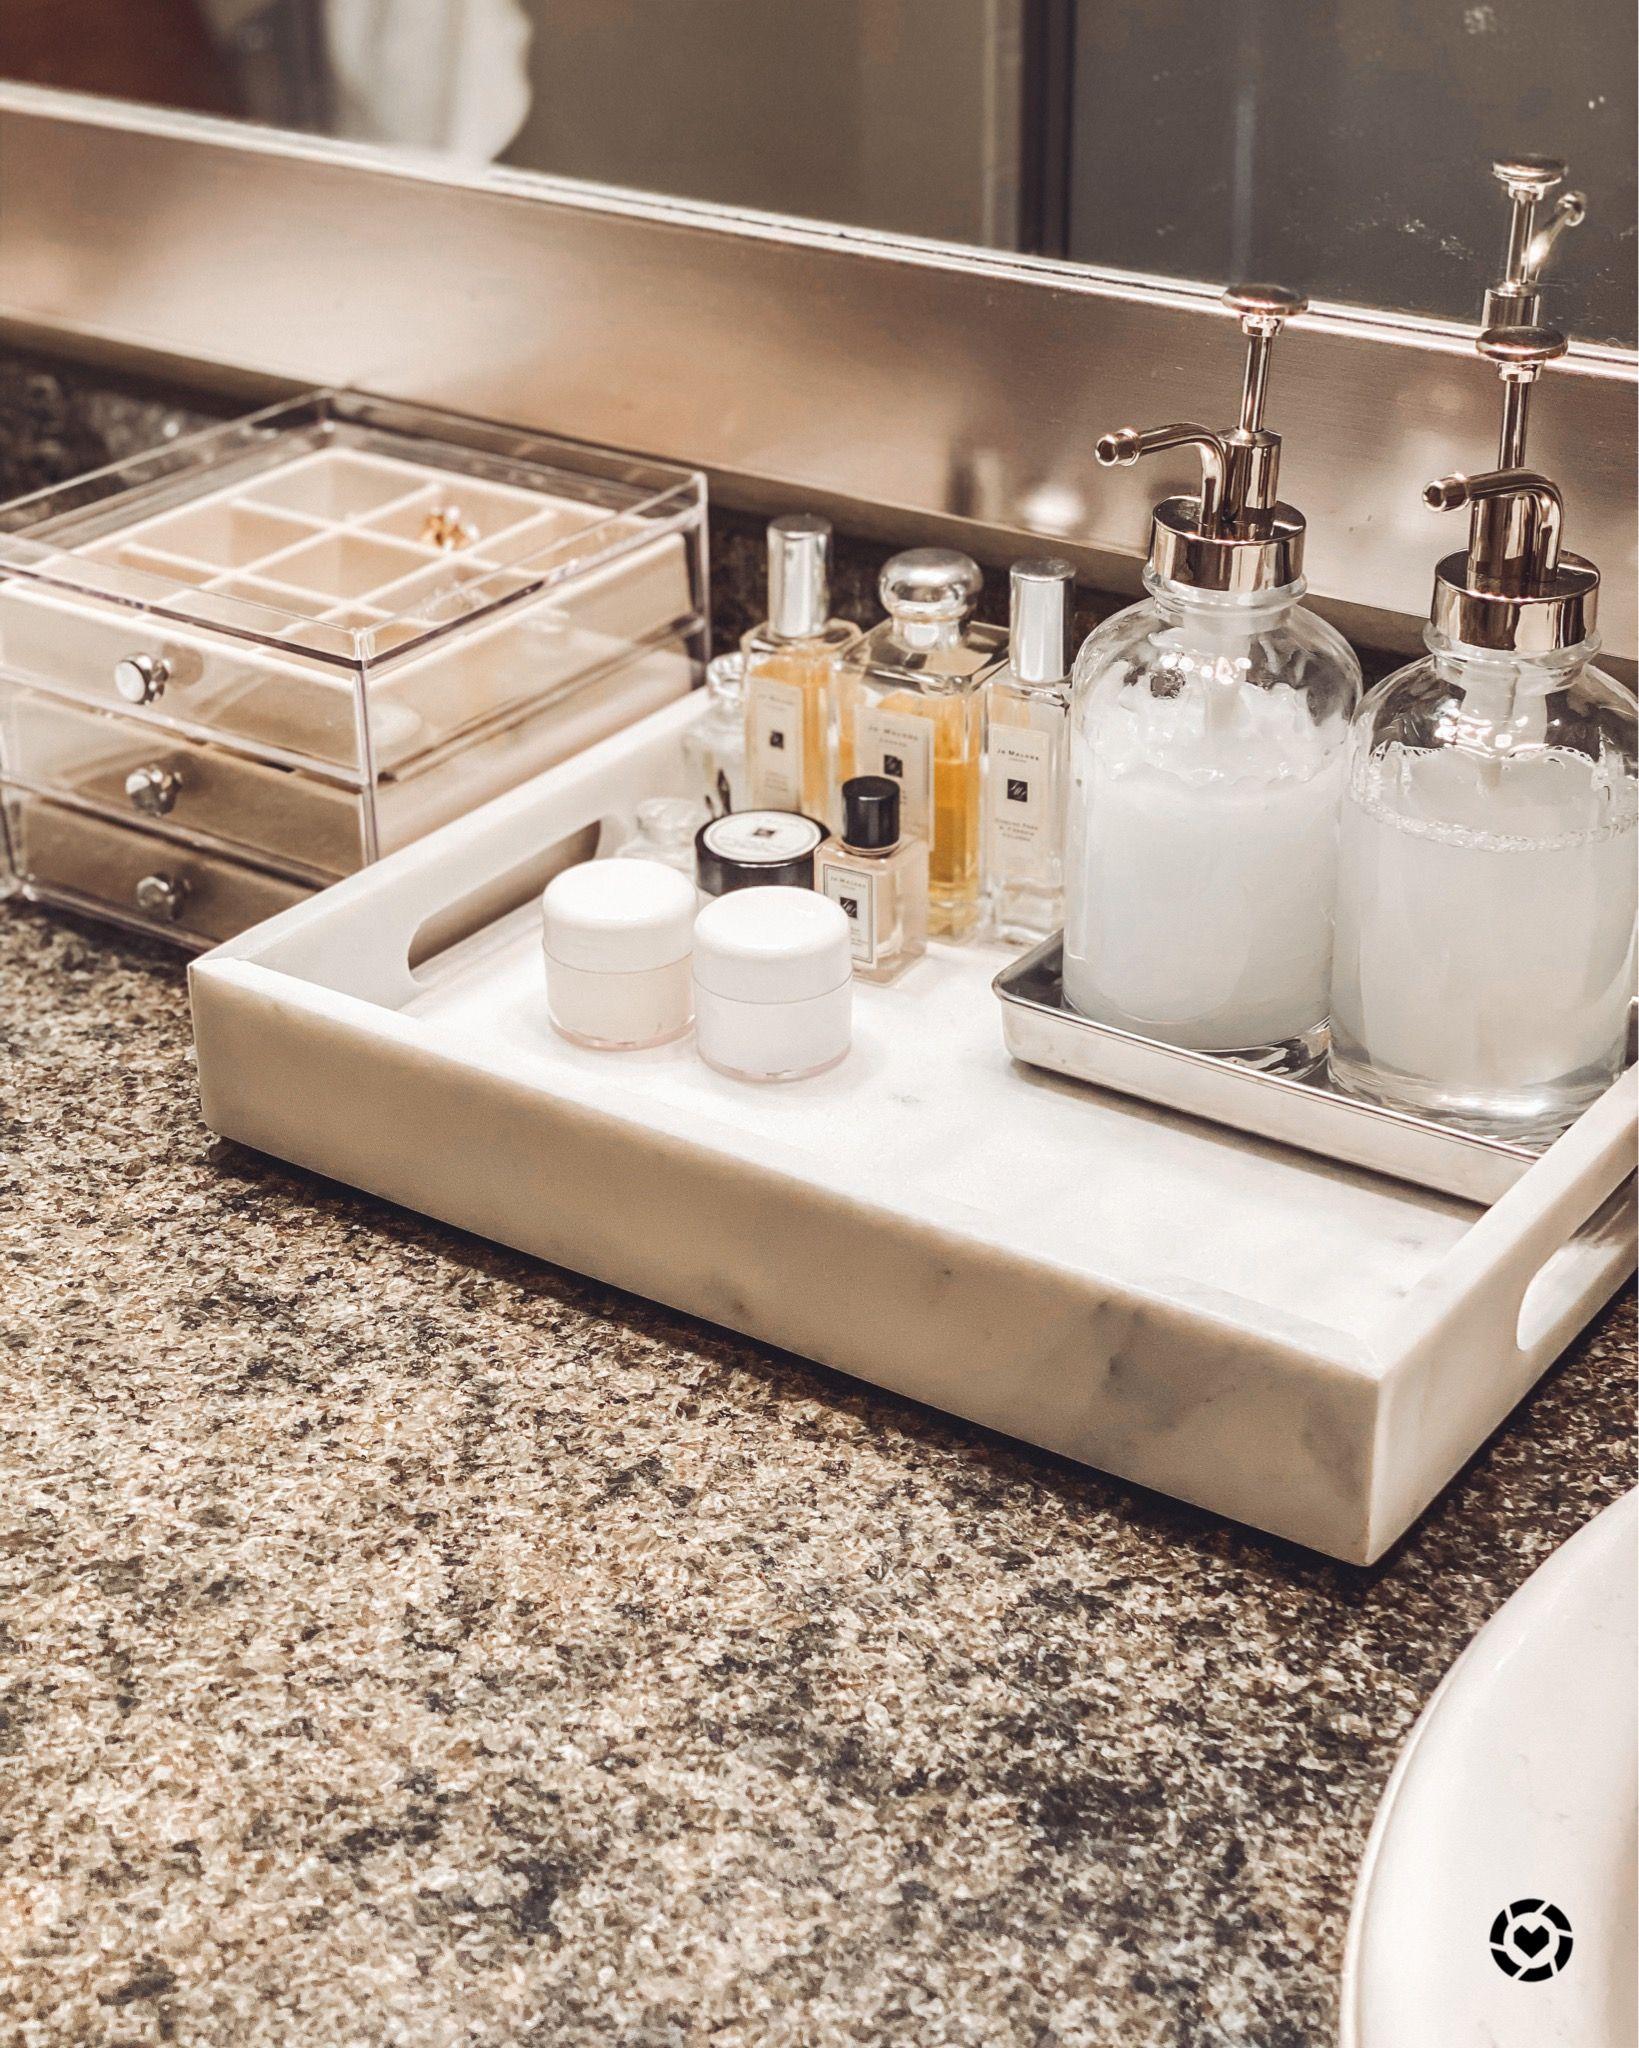 Bathroom Counter Organization In 2020 Bathroom Counter Organization Bathroom Counters Bathroom Counter Decor